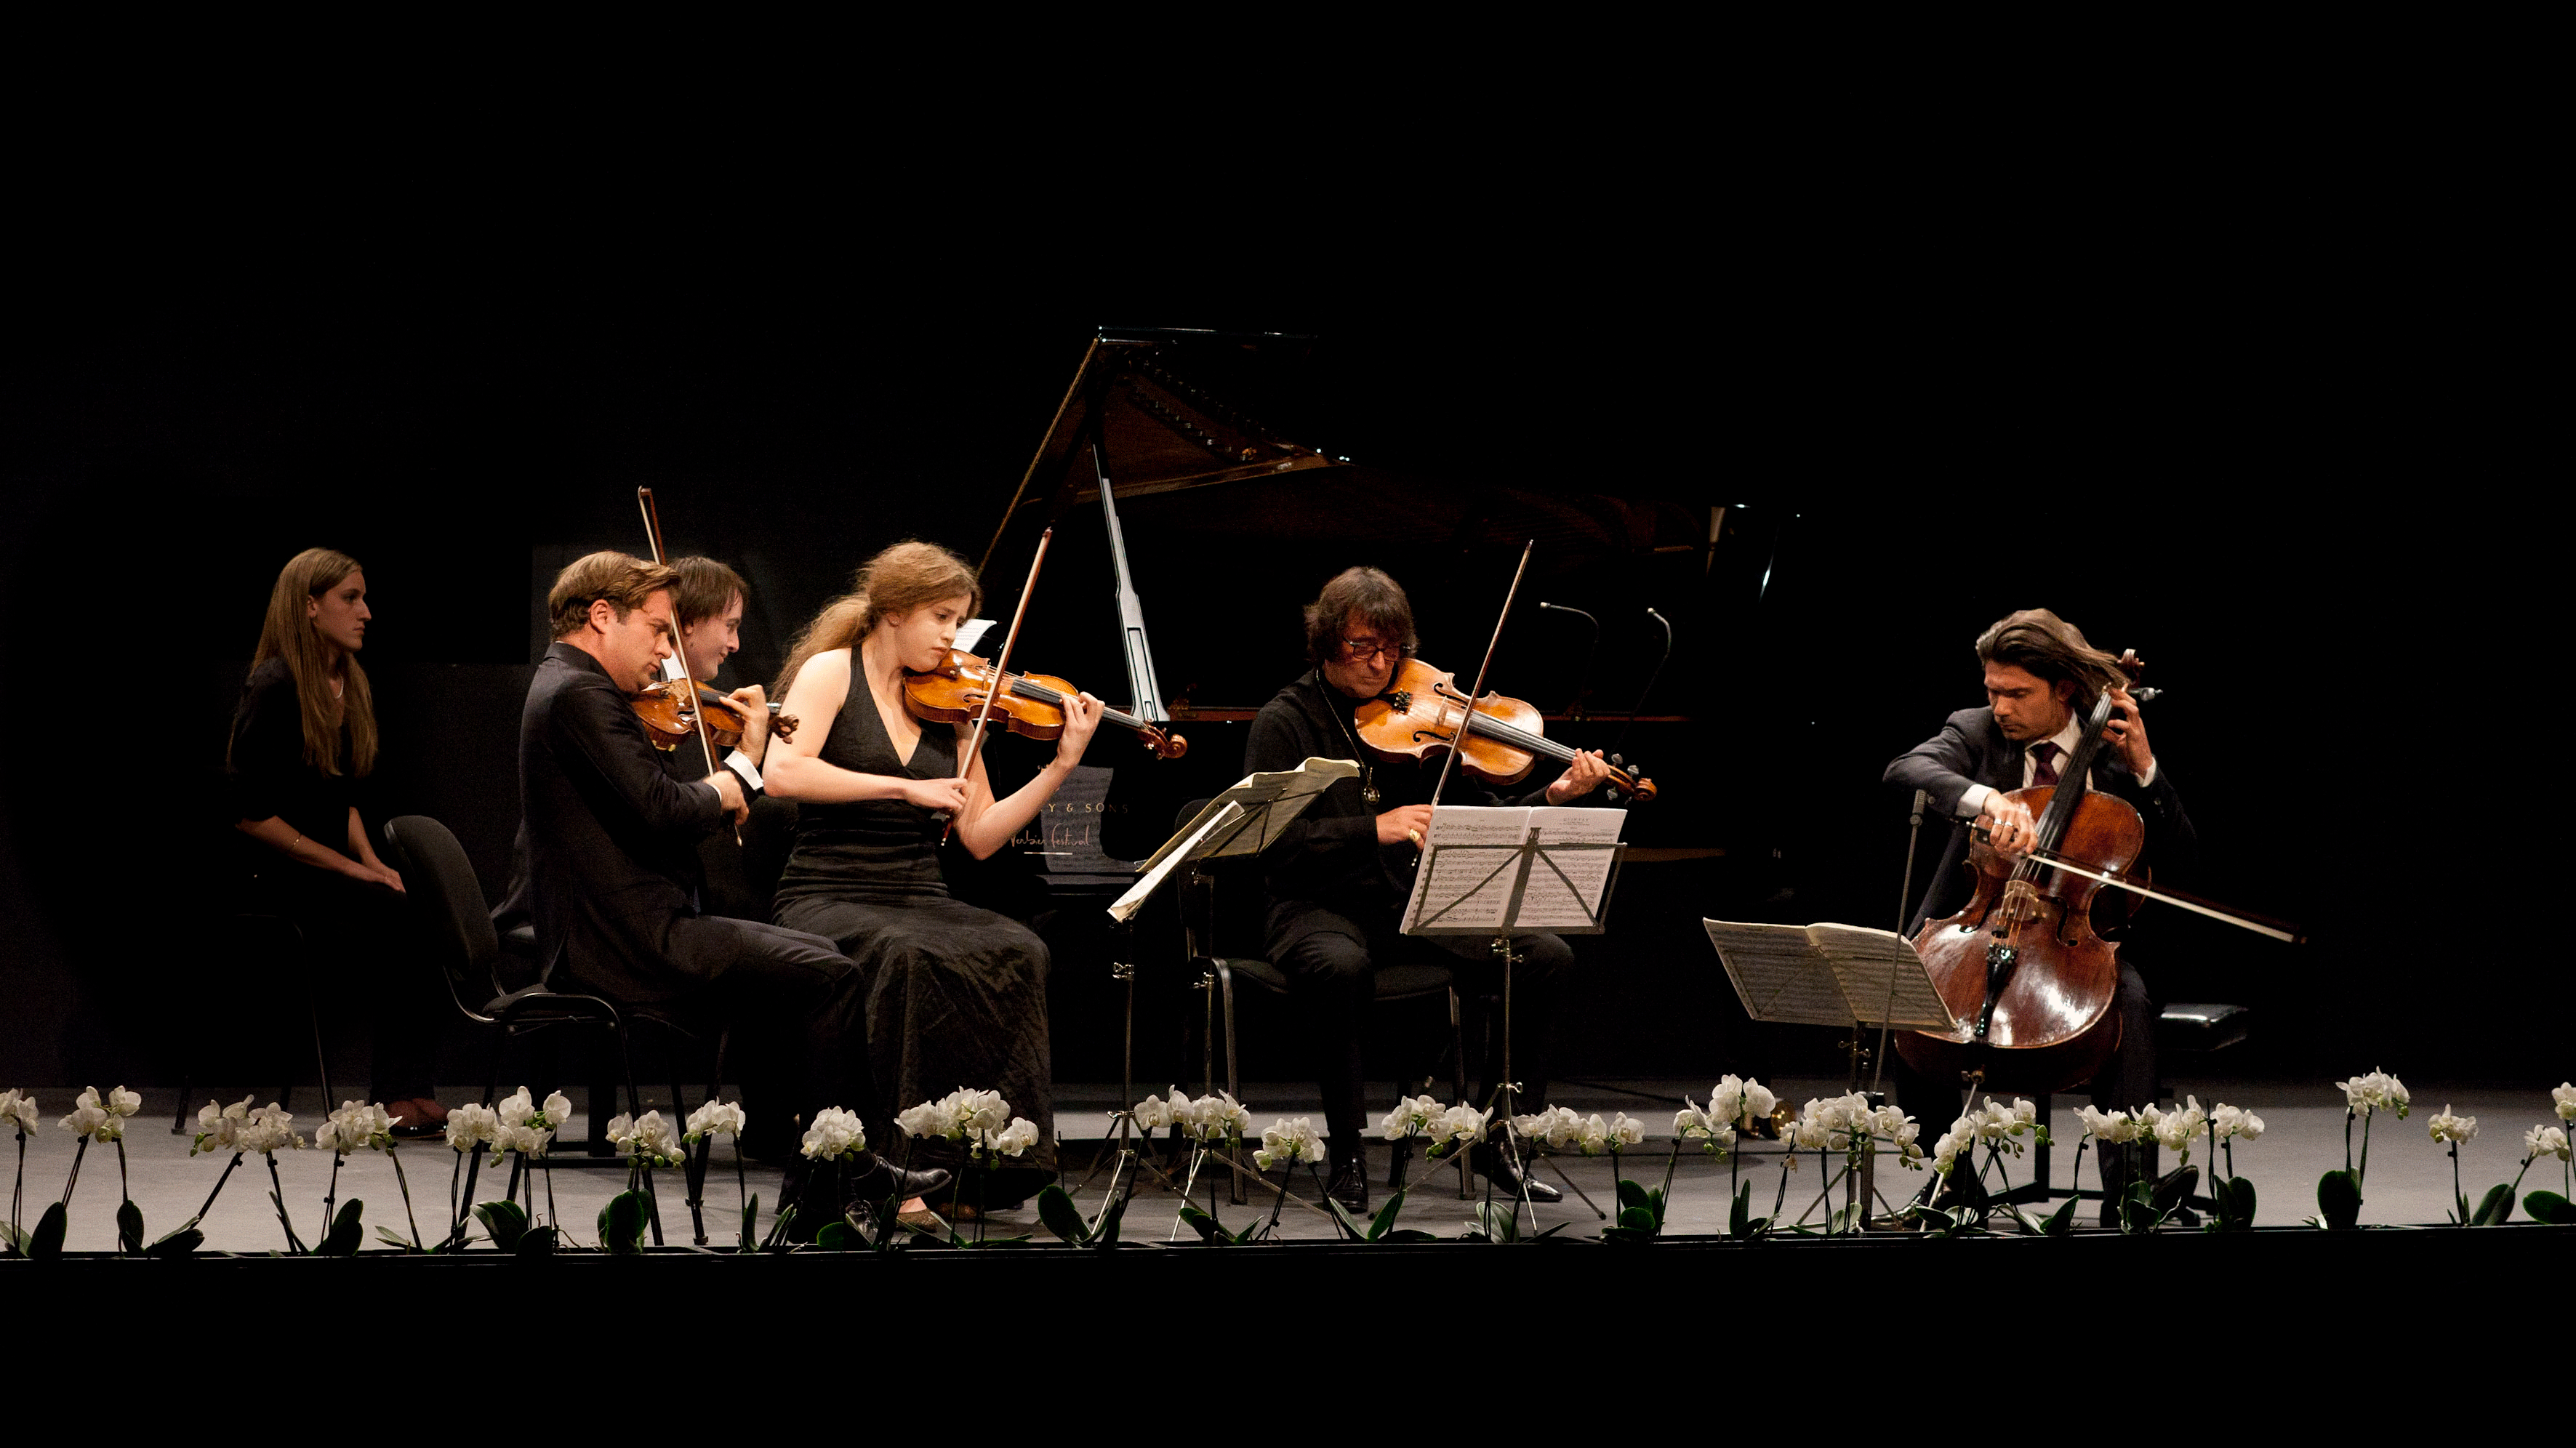 Antonín Dvořák à Verbier